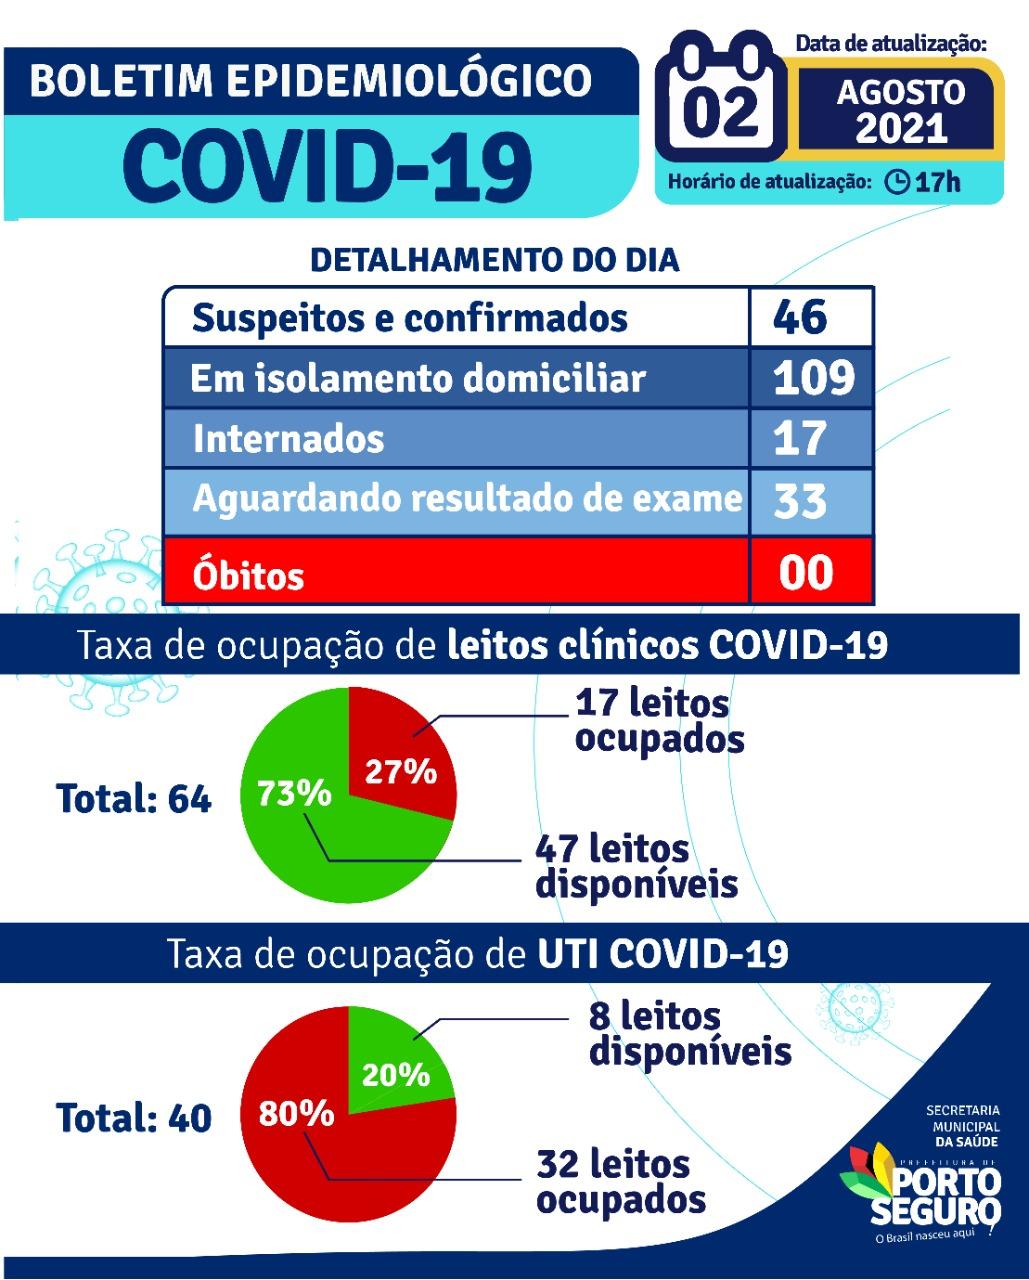 Porto Seguro: Boletim Epidemiológico Covid-19 (02 de agosto) 22